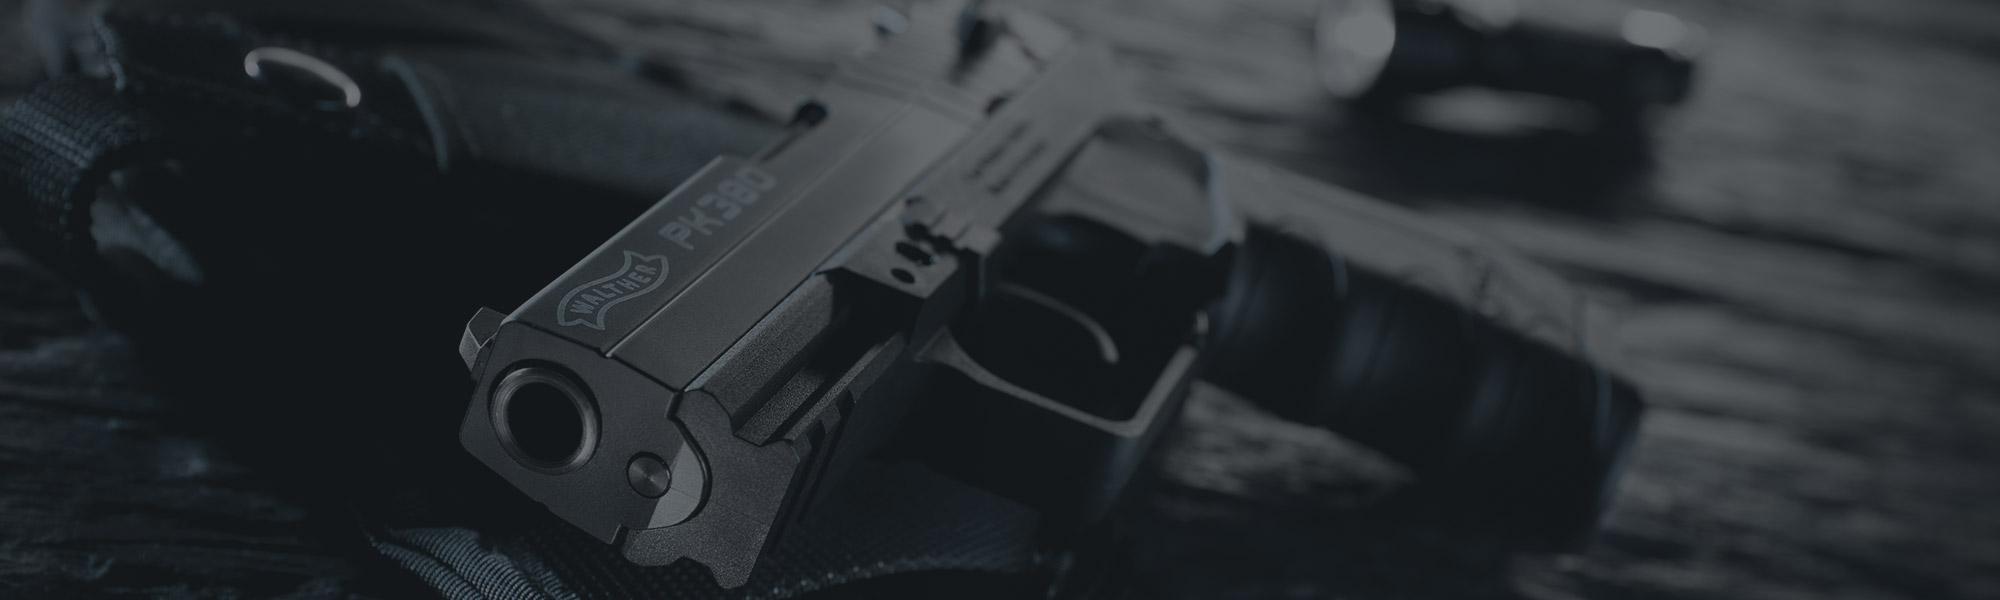 Walther - Gas Signal Guns